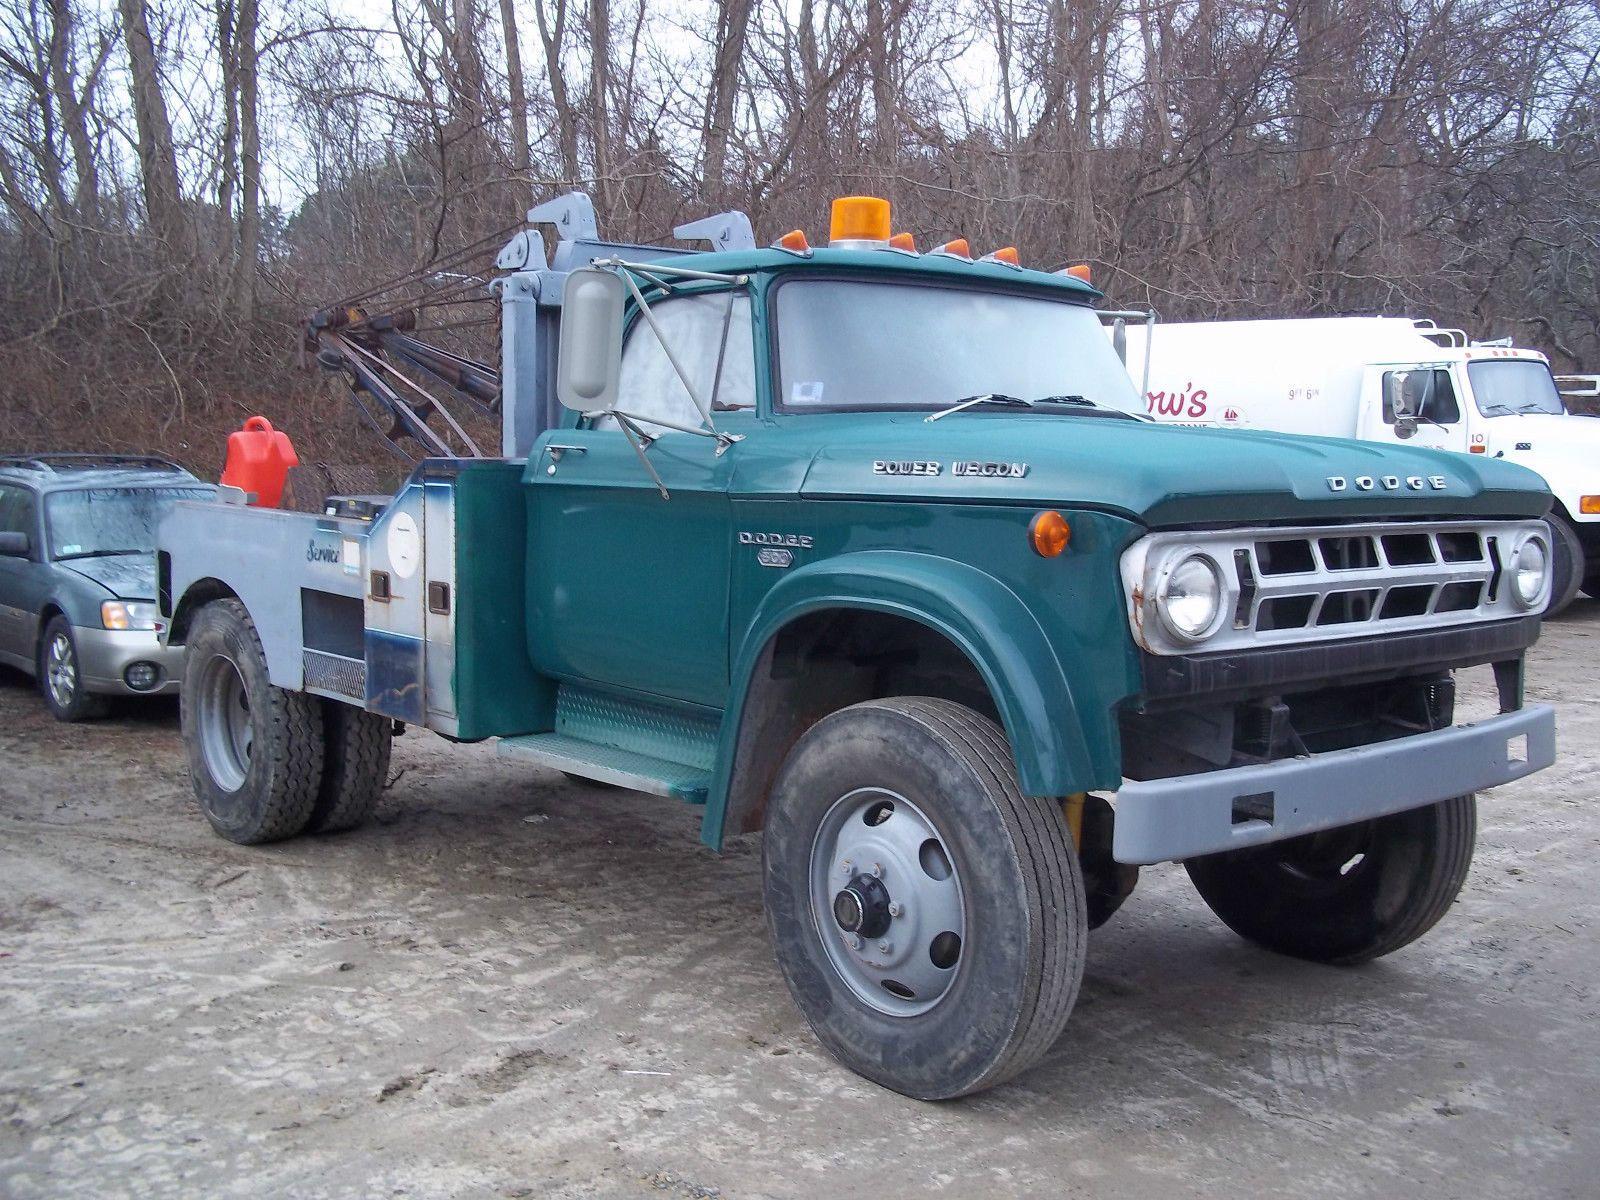 1968 Dodge Power Wagon W500 4x4/Dually wrecker | Wreckers, RollBacks ...